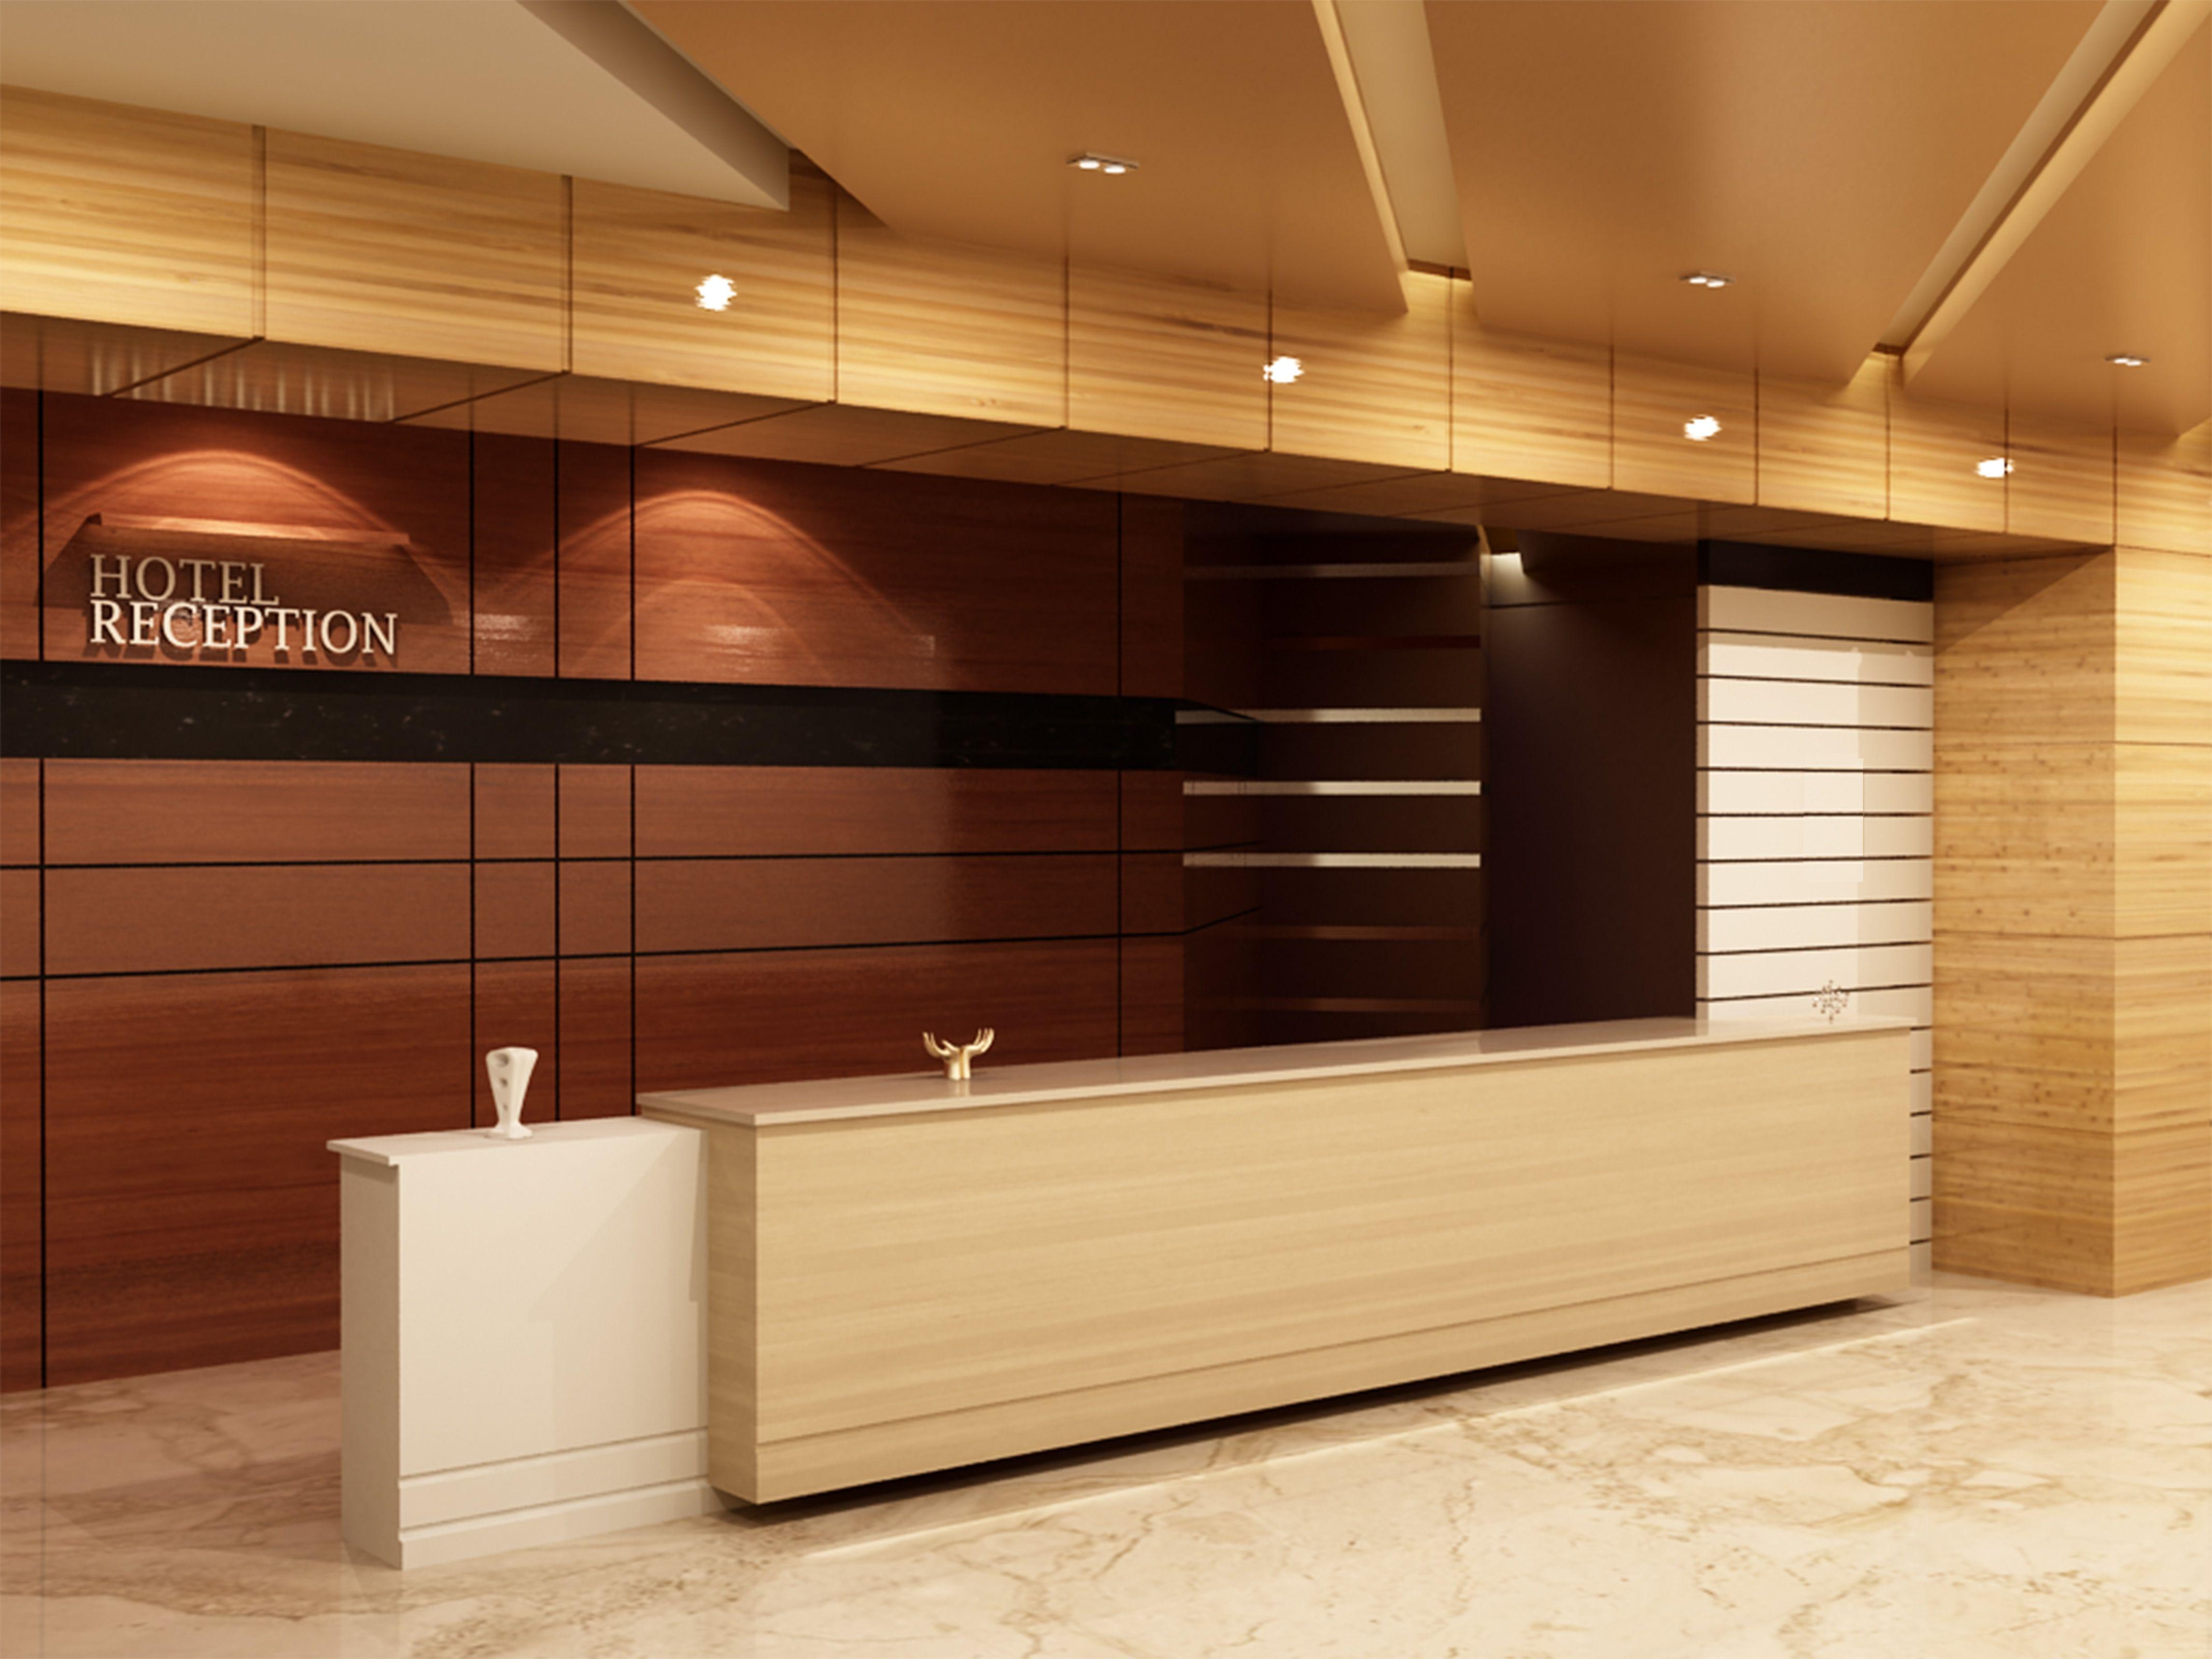 www.loversiq.com daut as f h home-office-receptionist-desk-